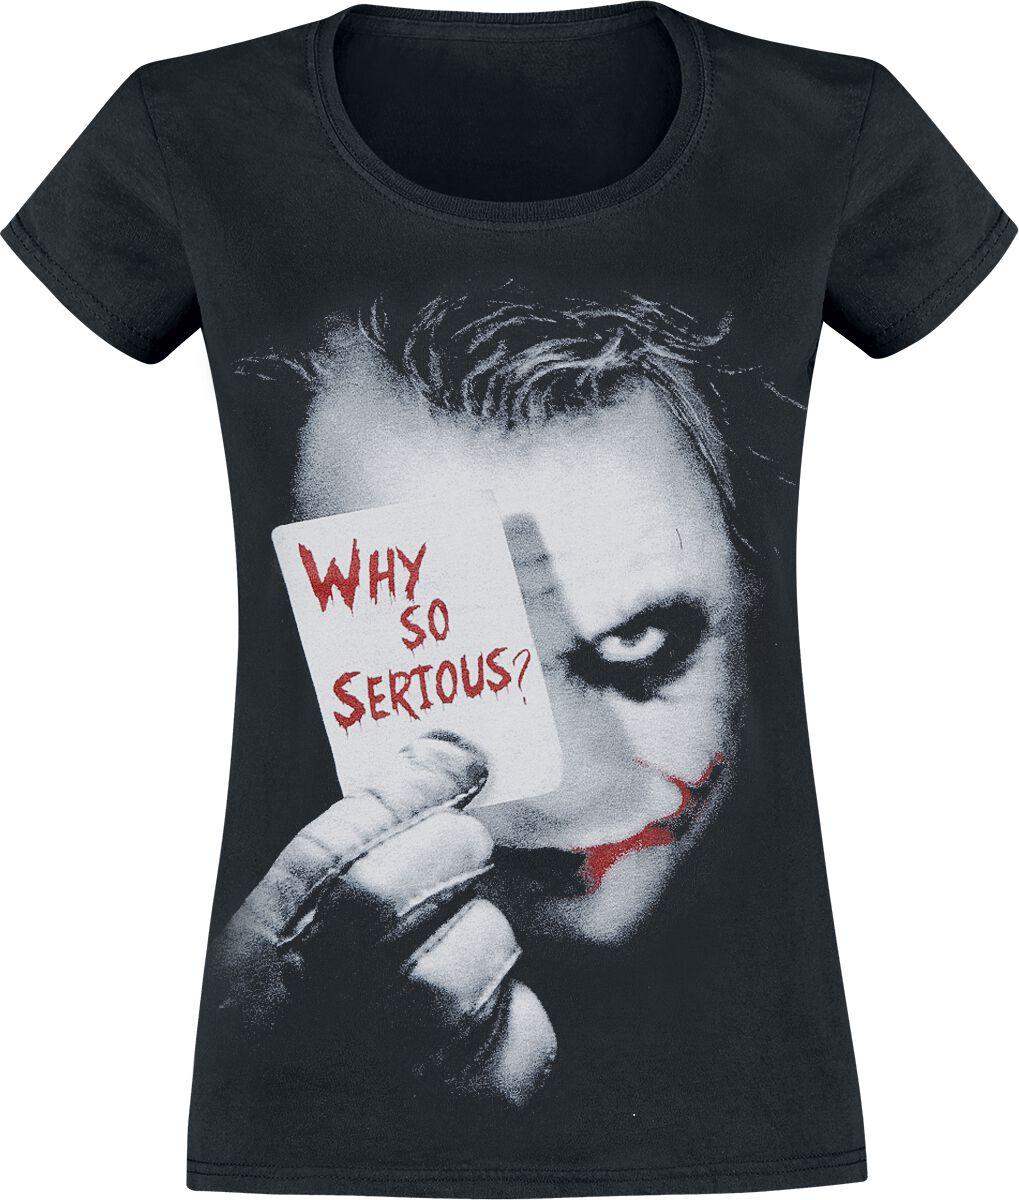 The Joker Why So Serious? Koszulka damska czarny